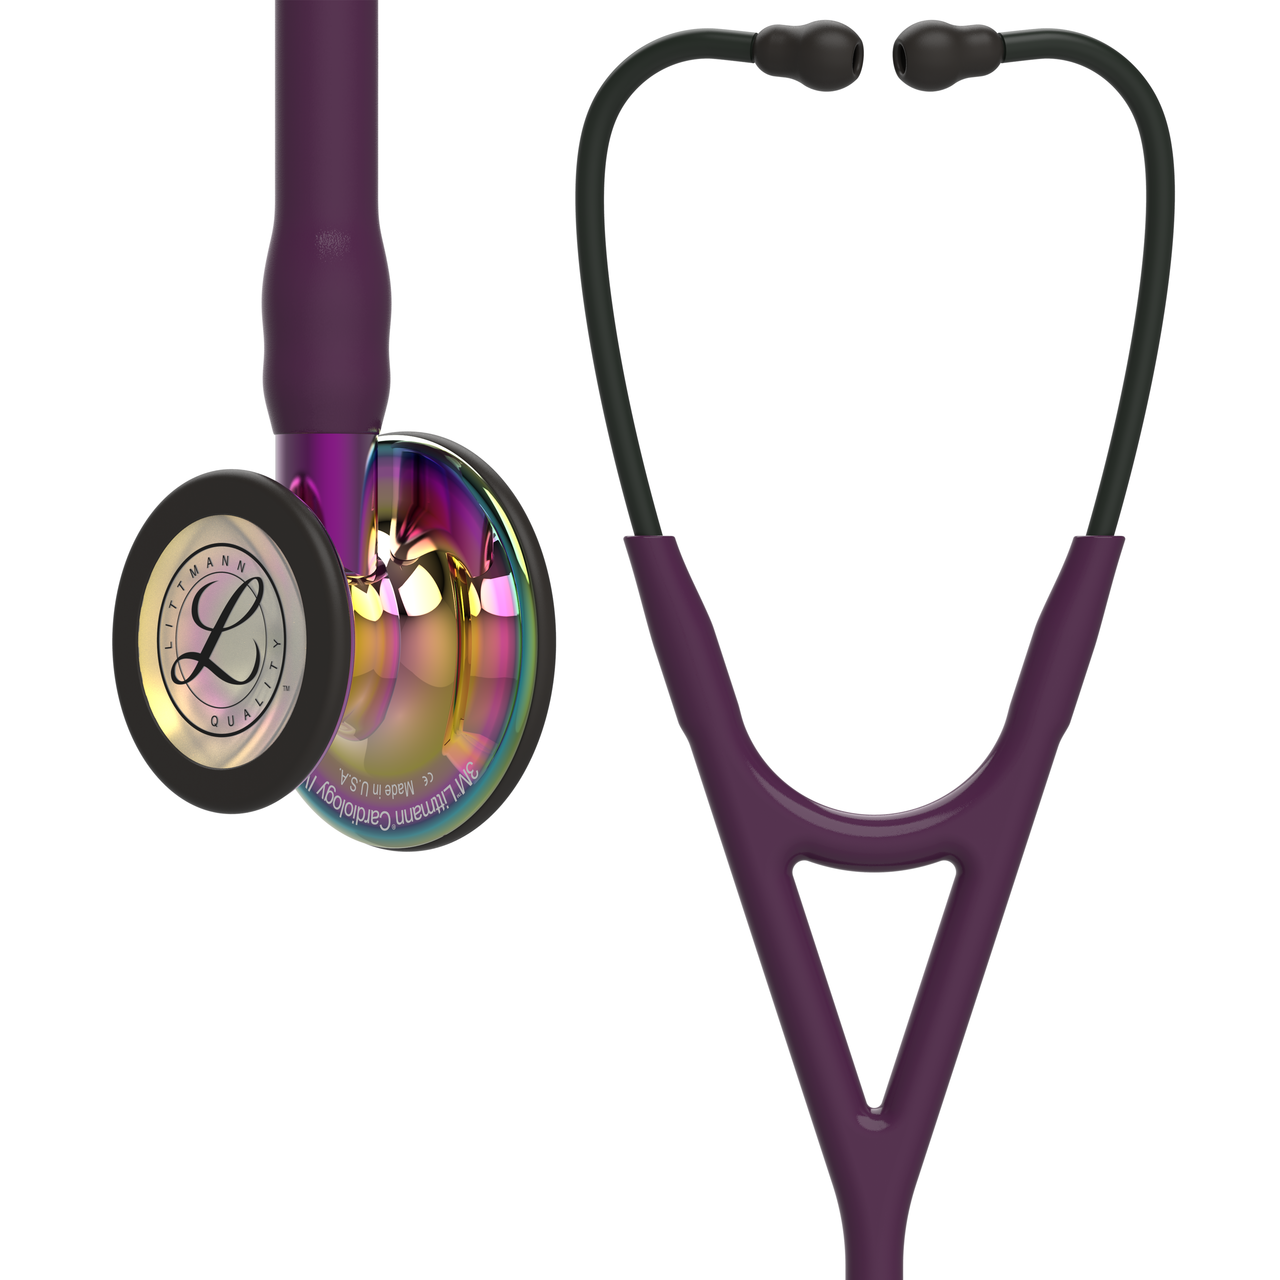 Littmann Cardiology IV Stethoscope, Rainbow Plum Violet, 6239